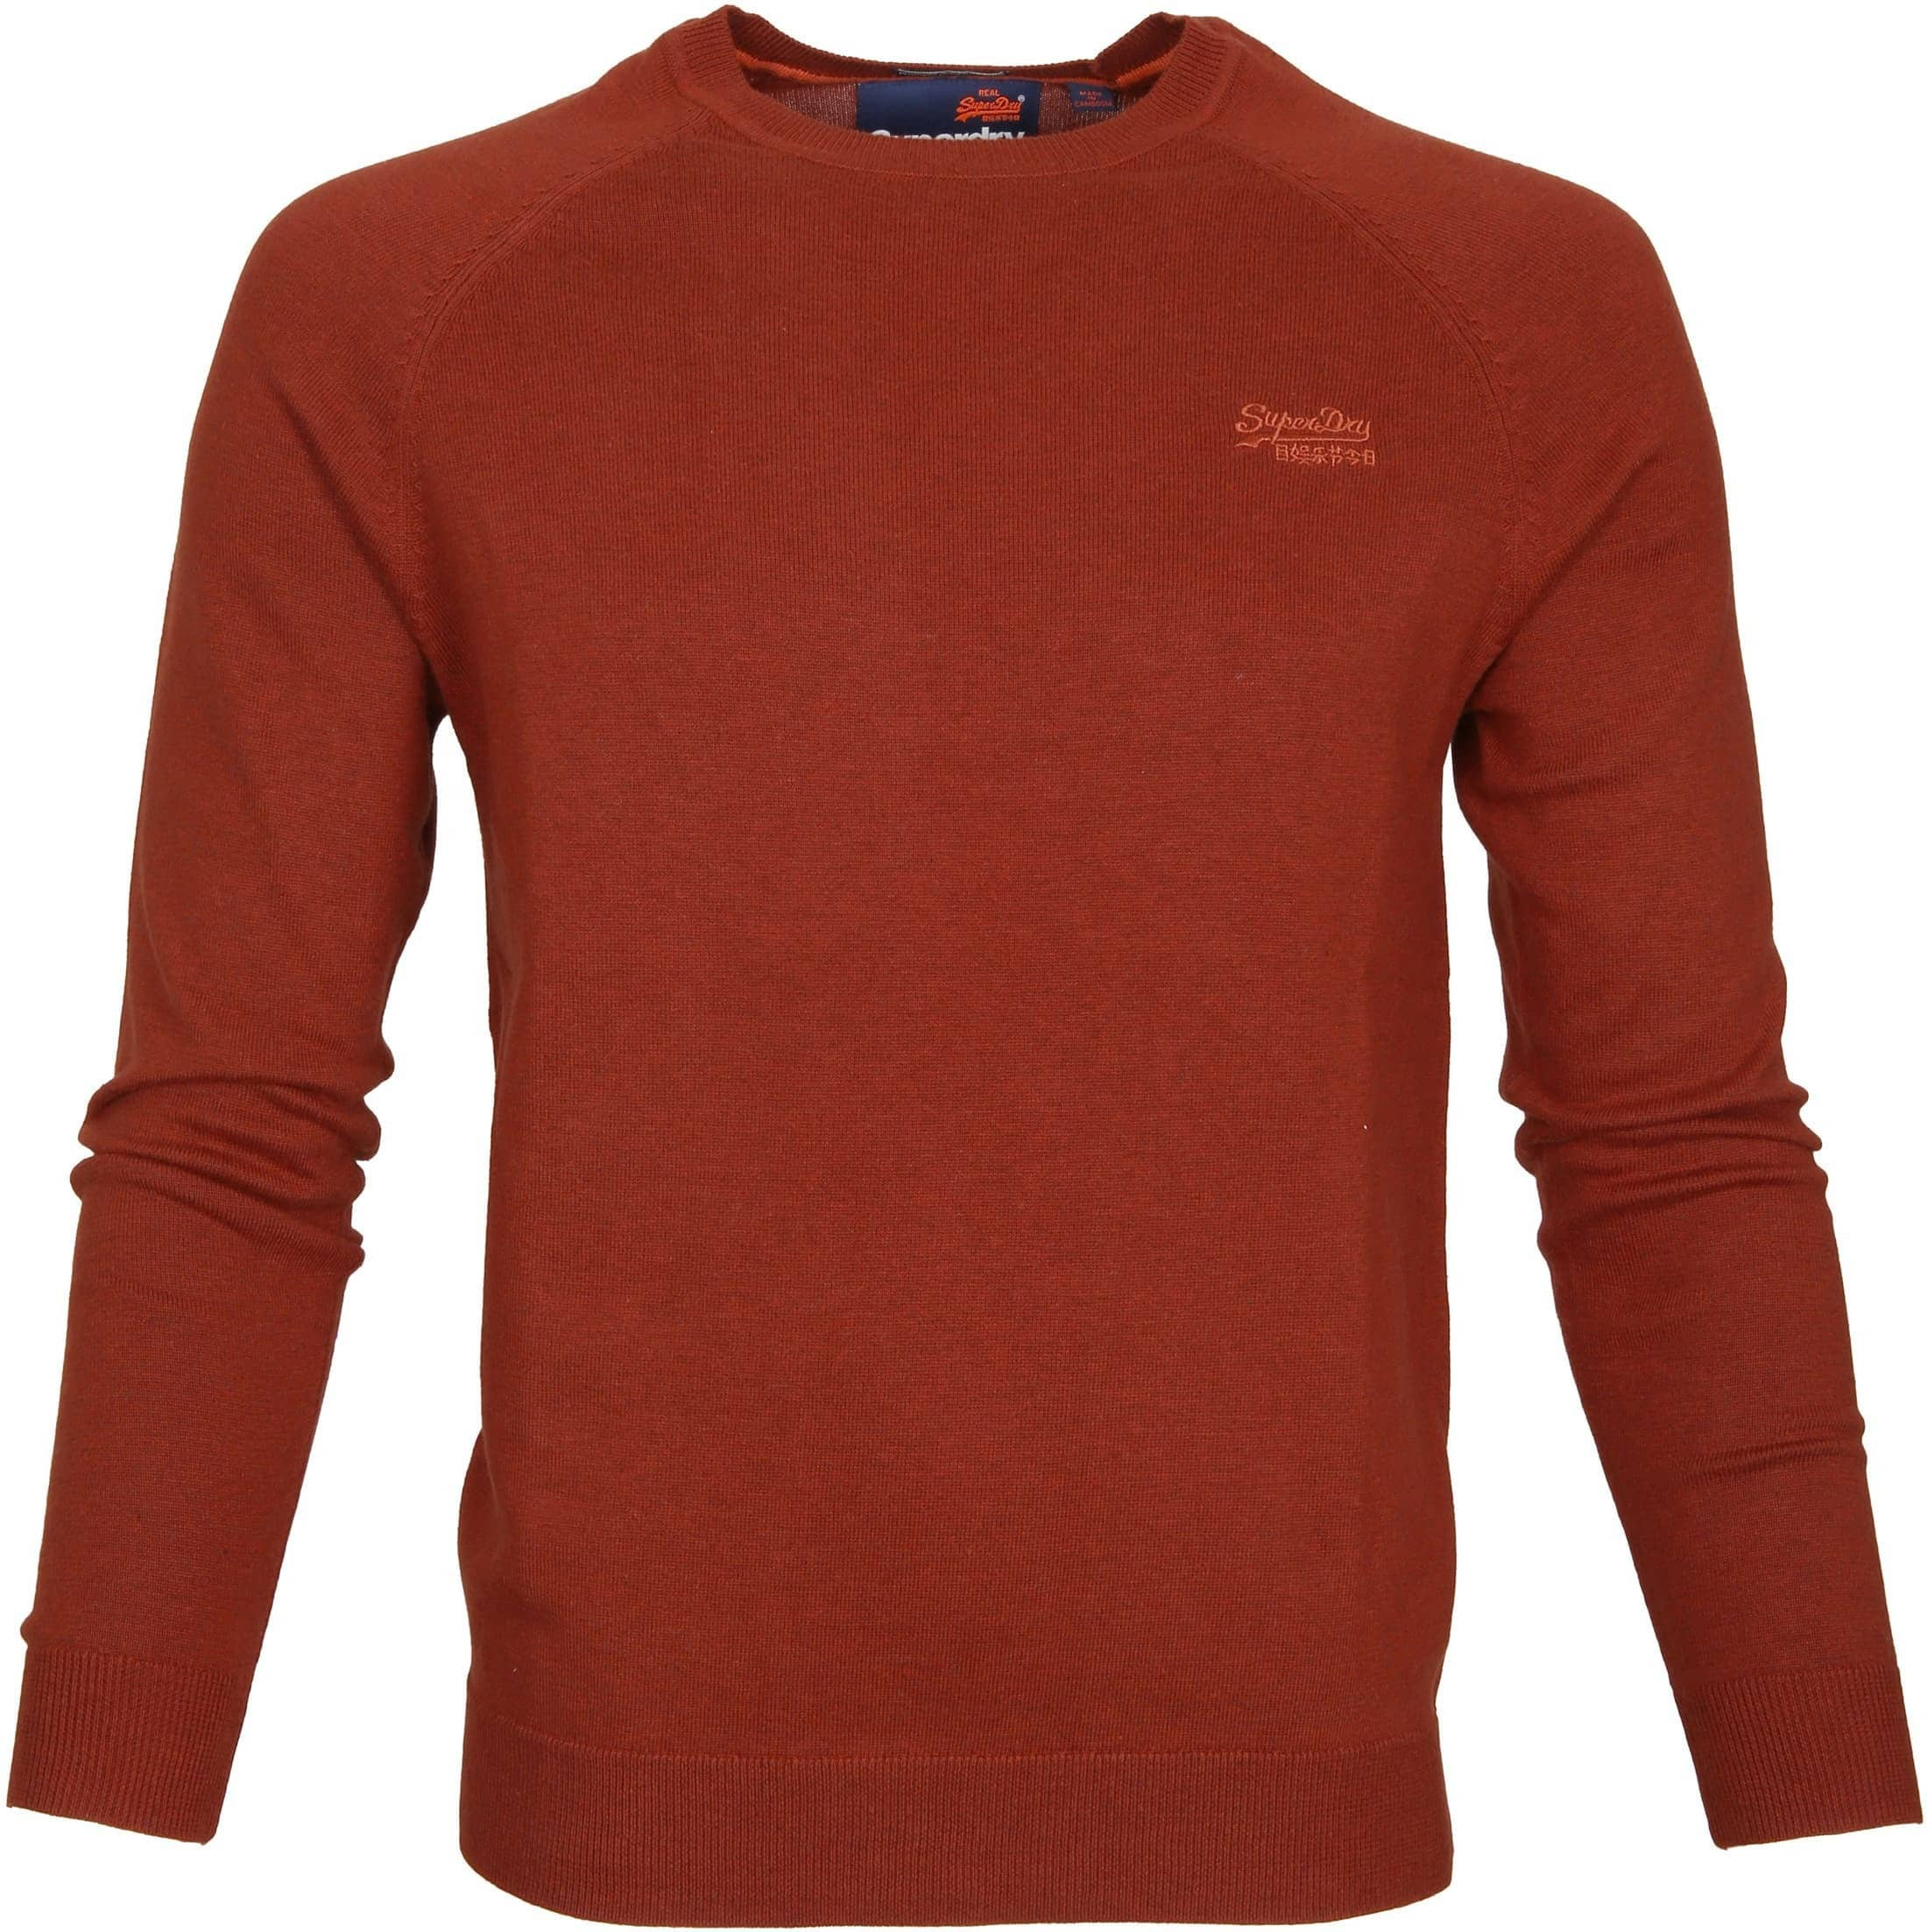 Superdry Sweater Melange Red Orange foto 0